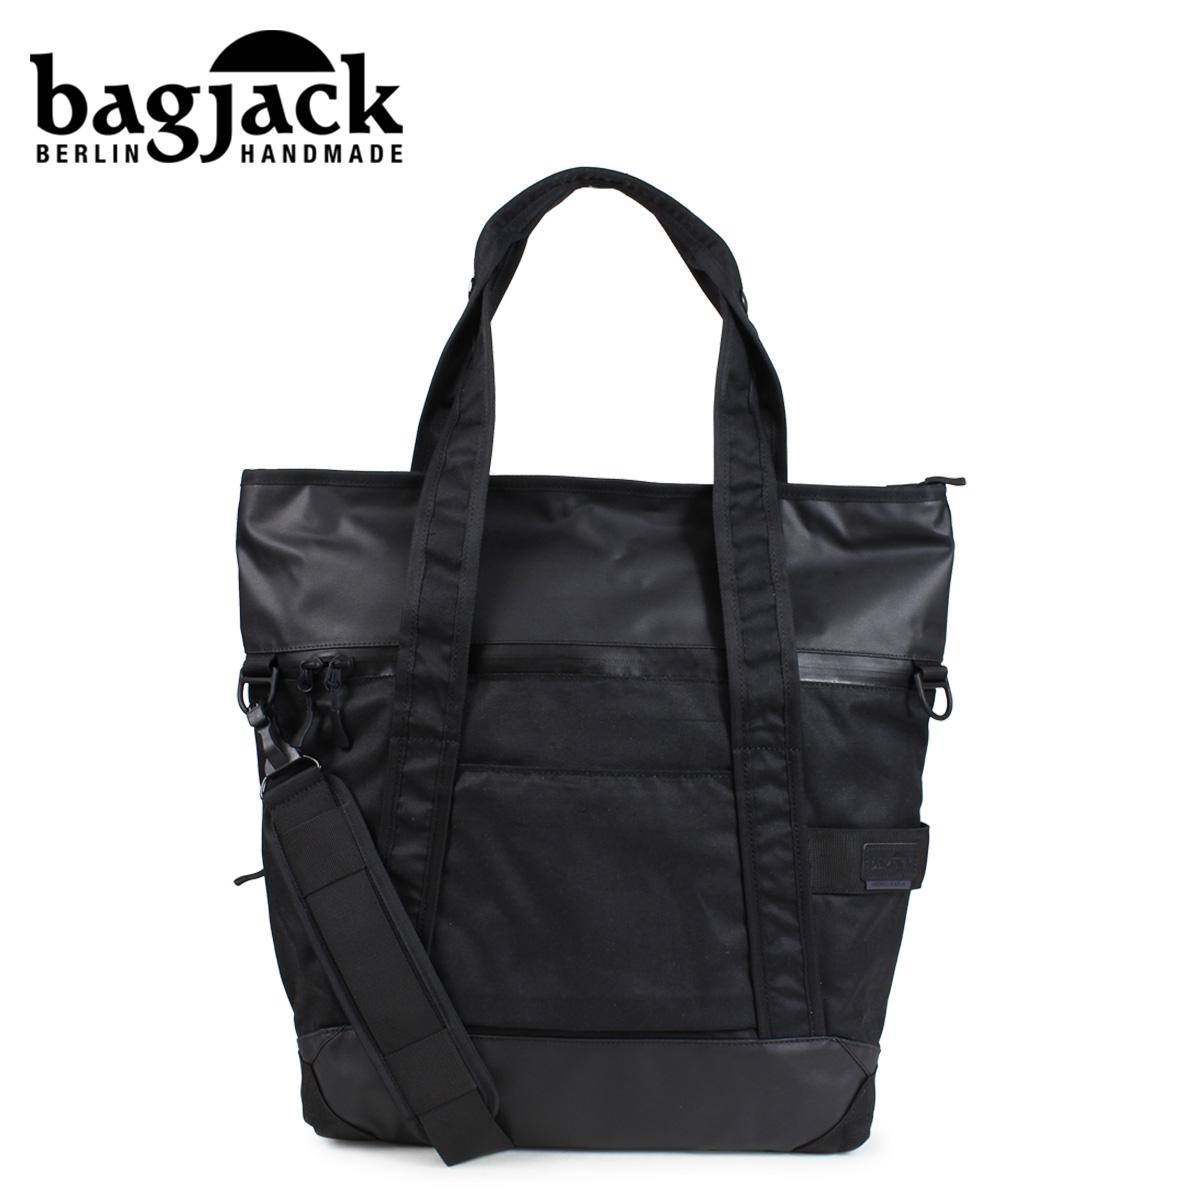 bagjack 3WAY NEXT LEVEL NATURE TEC TOTE バッグジャック トートバッグ メンズ レディース 24L ブラック